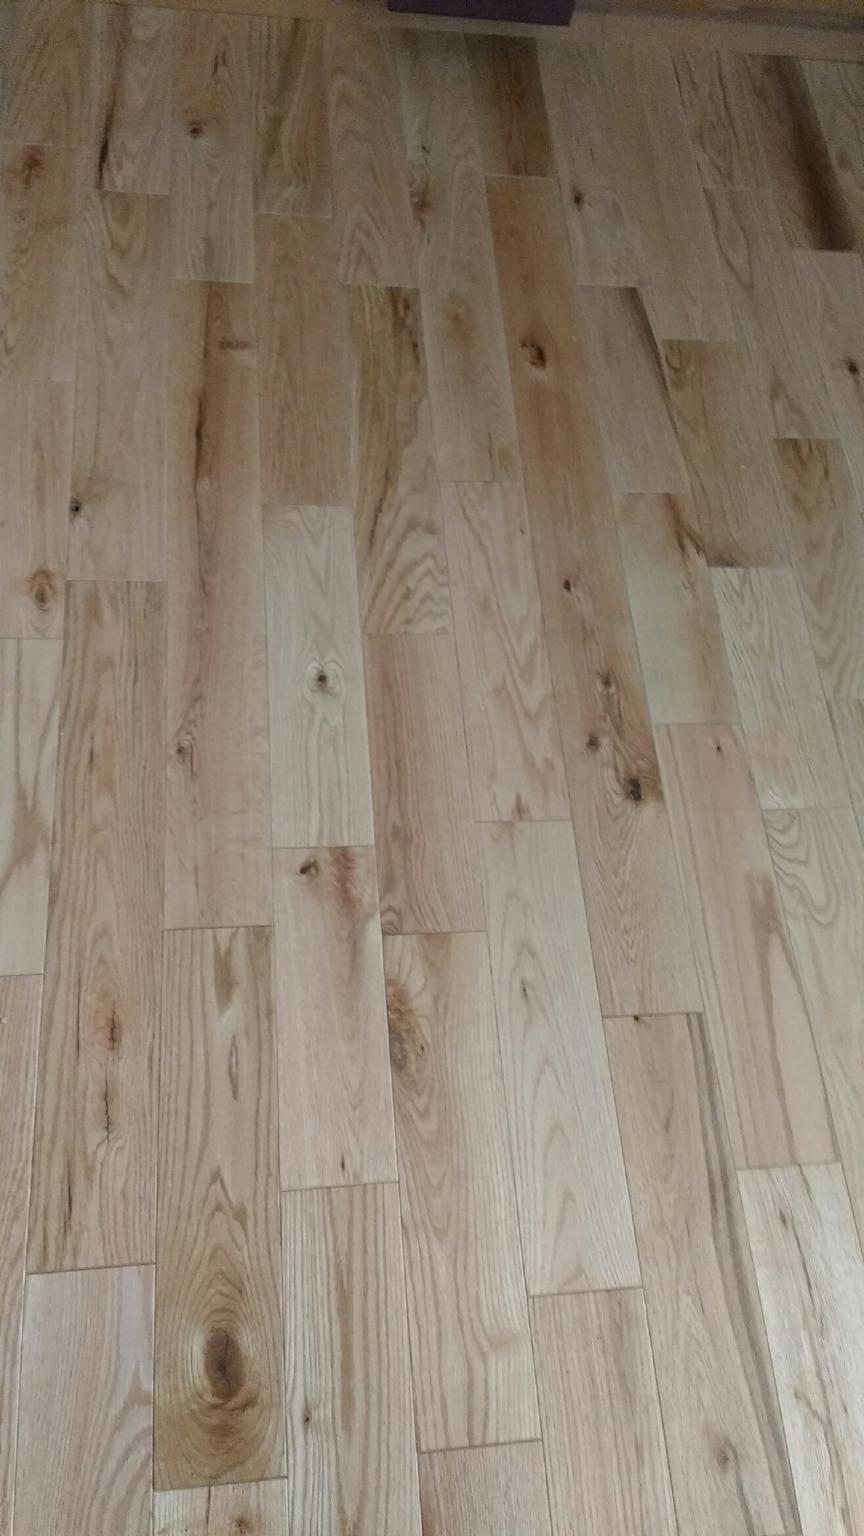 Maine Traditions Hardwood Flooring Red Oak Rustic Grade Clear Uv Finish Available In 2 1 4 3 1 4 4 Hardwood Floors Hardwood Maple Floors